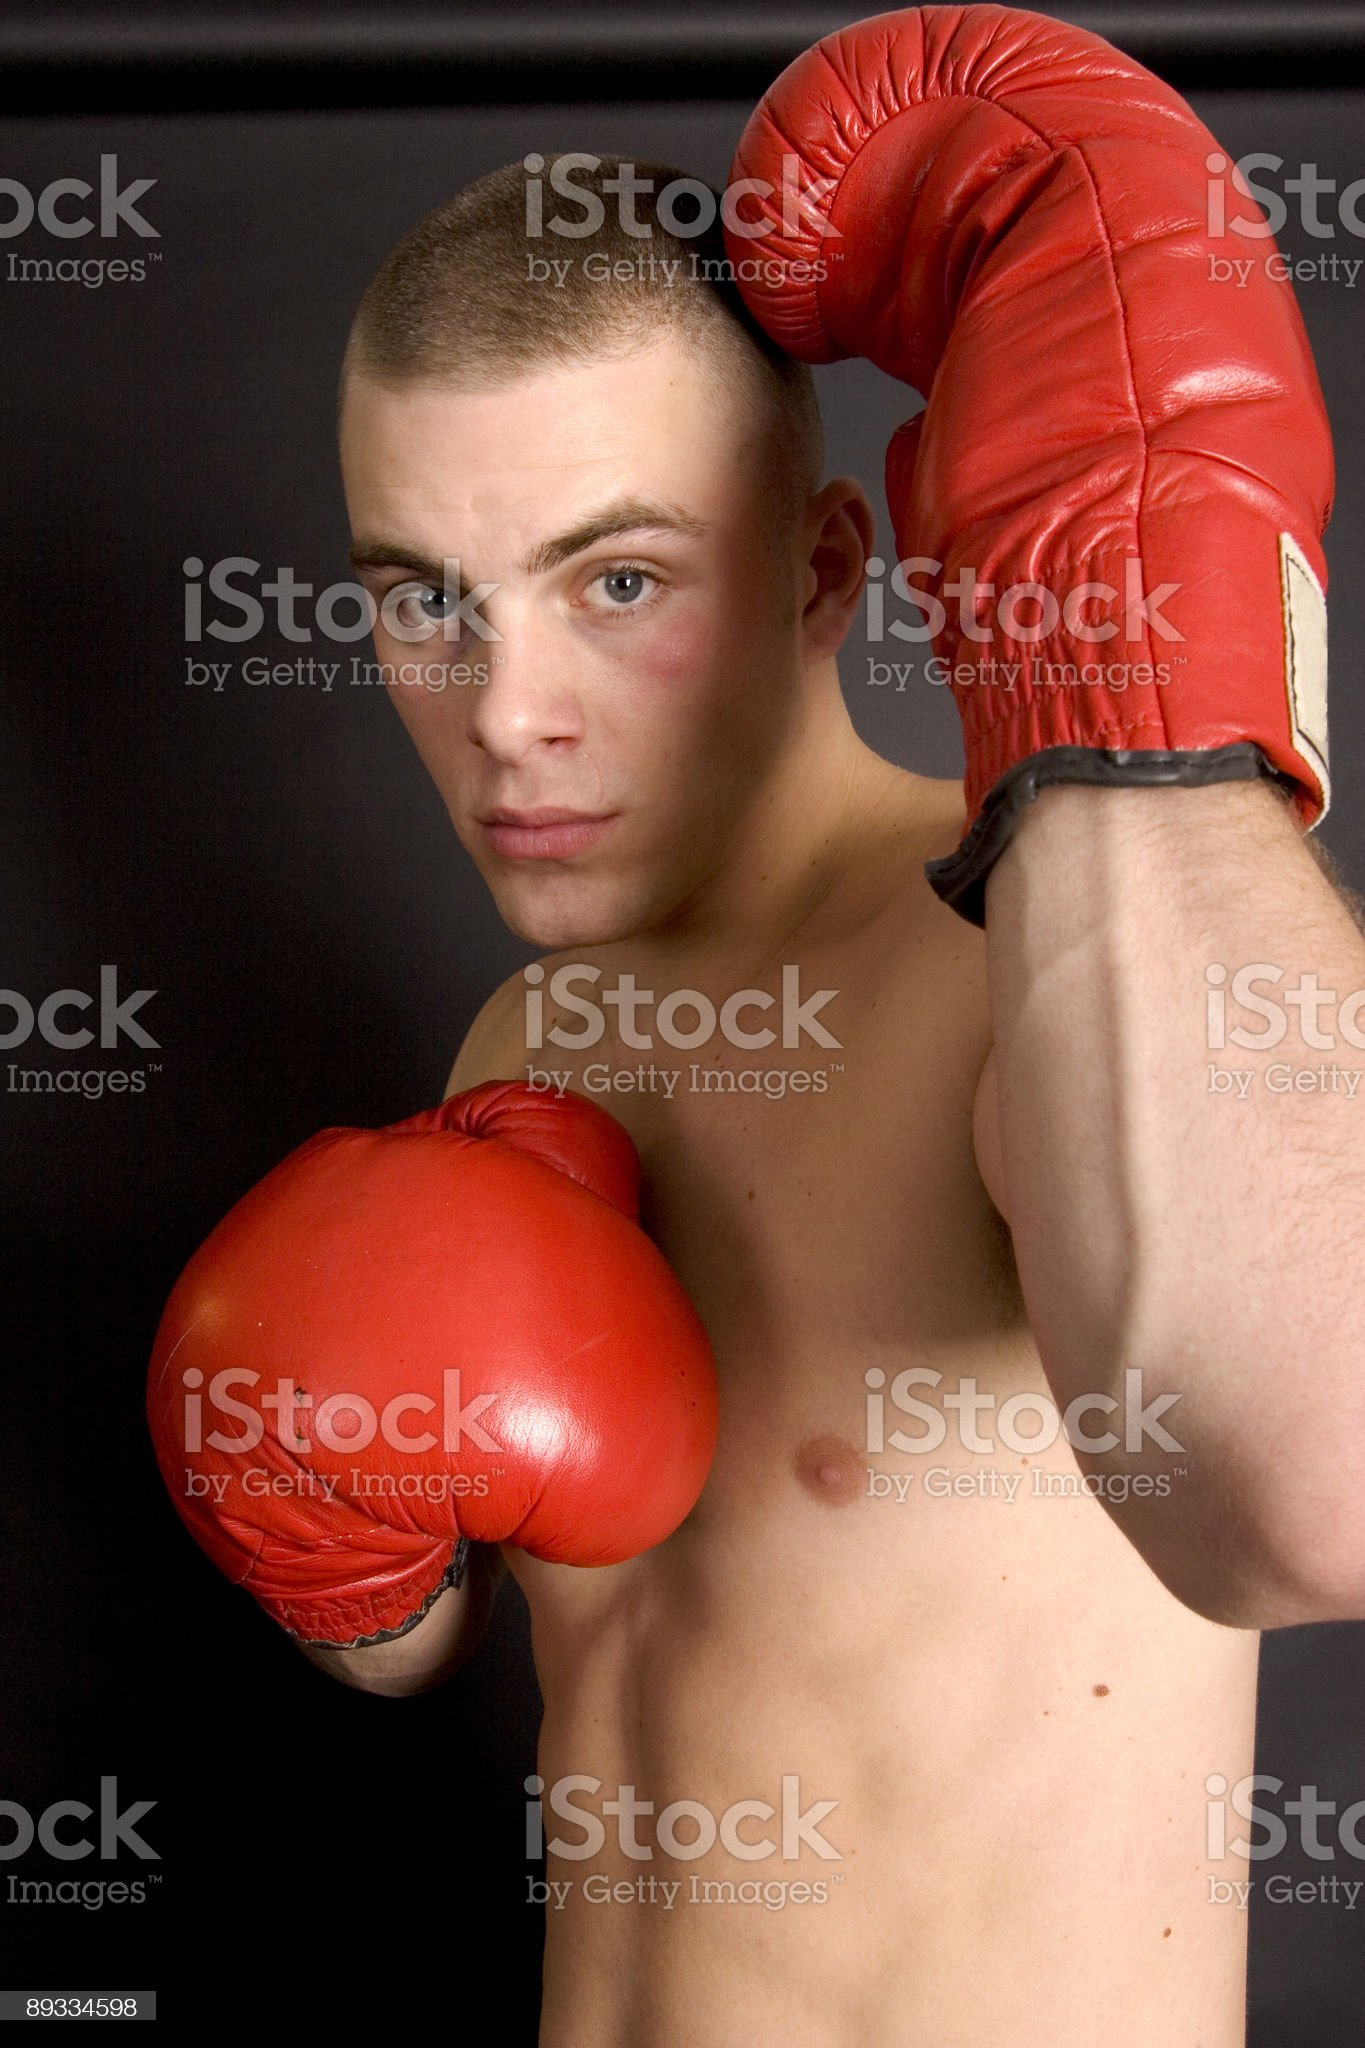 Punch blocker royalty-free stock photo